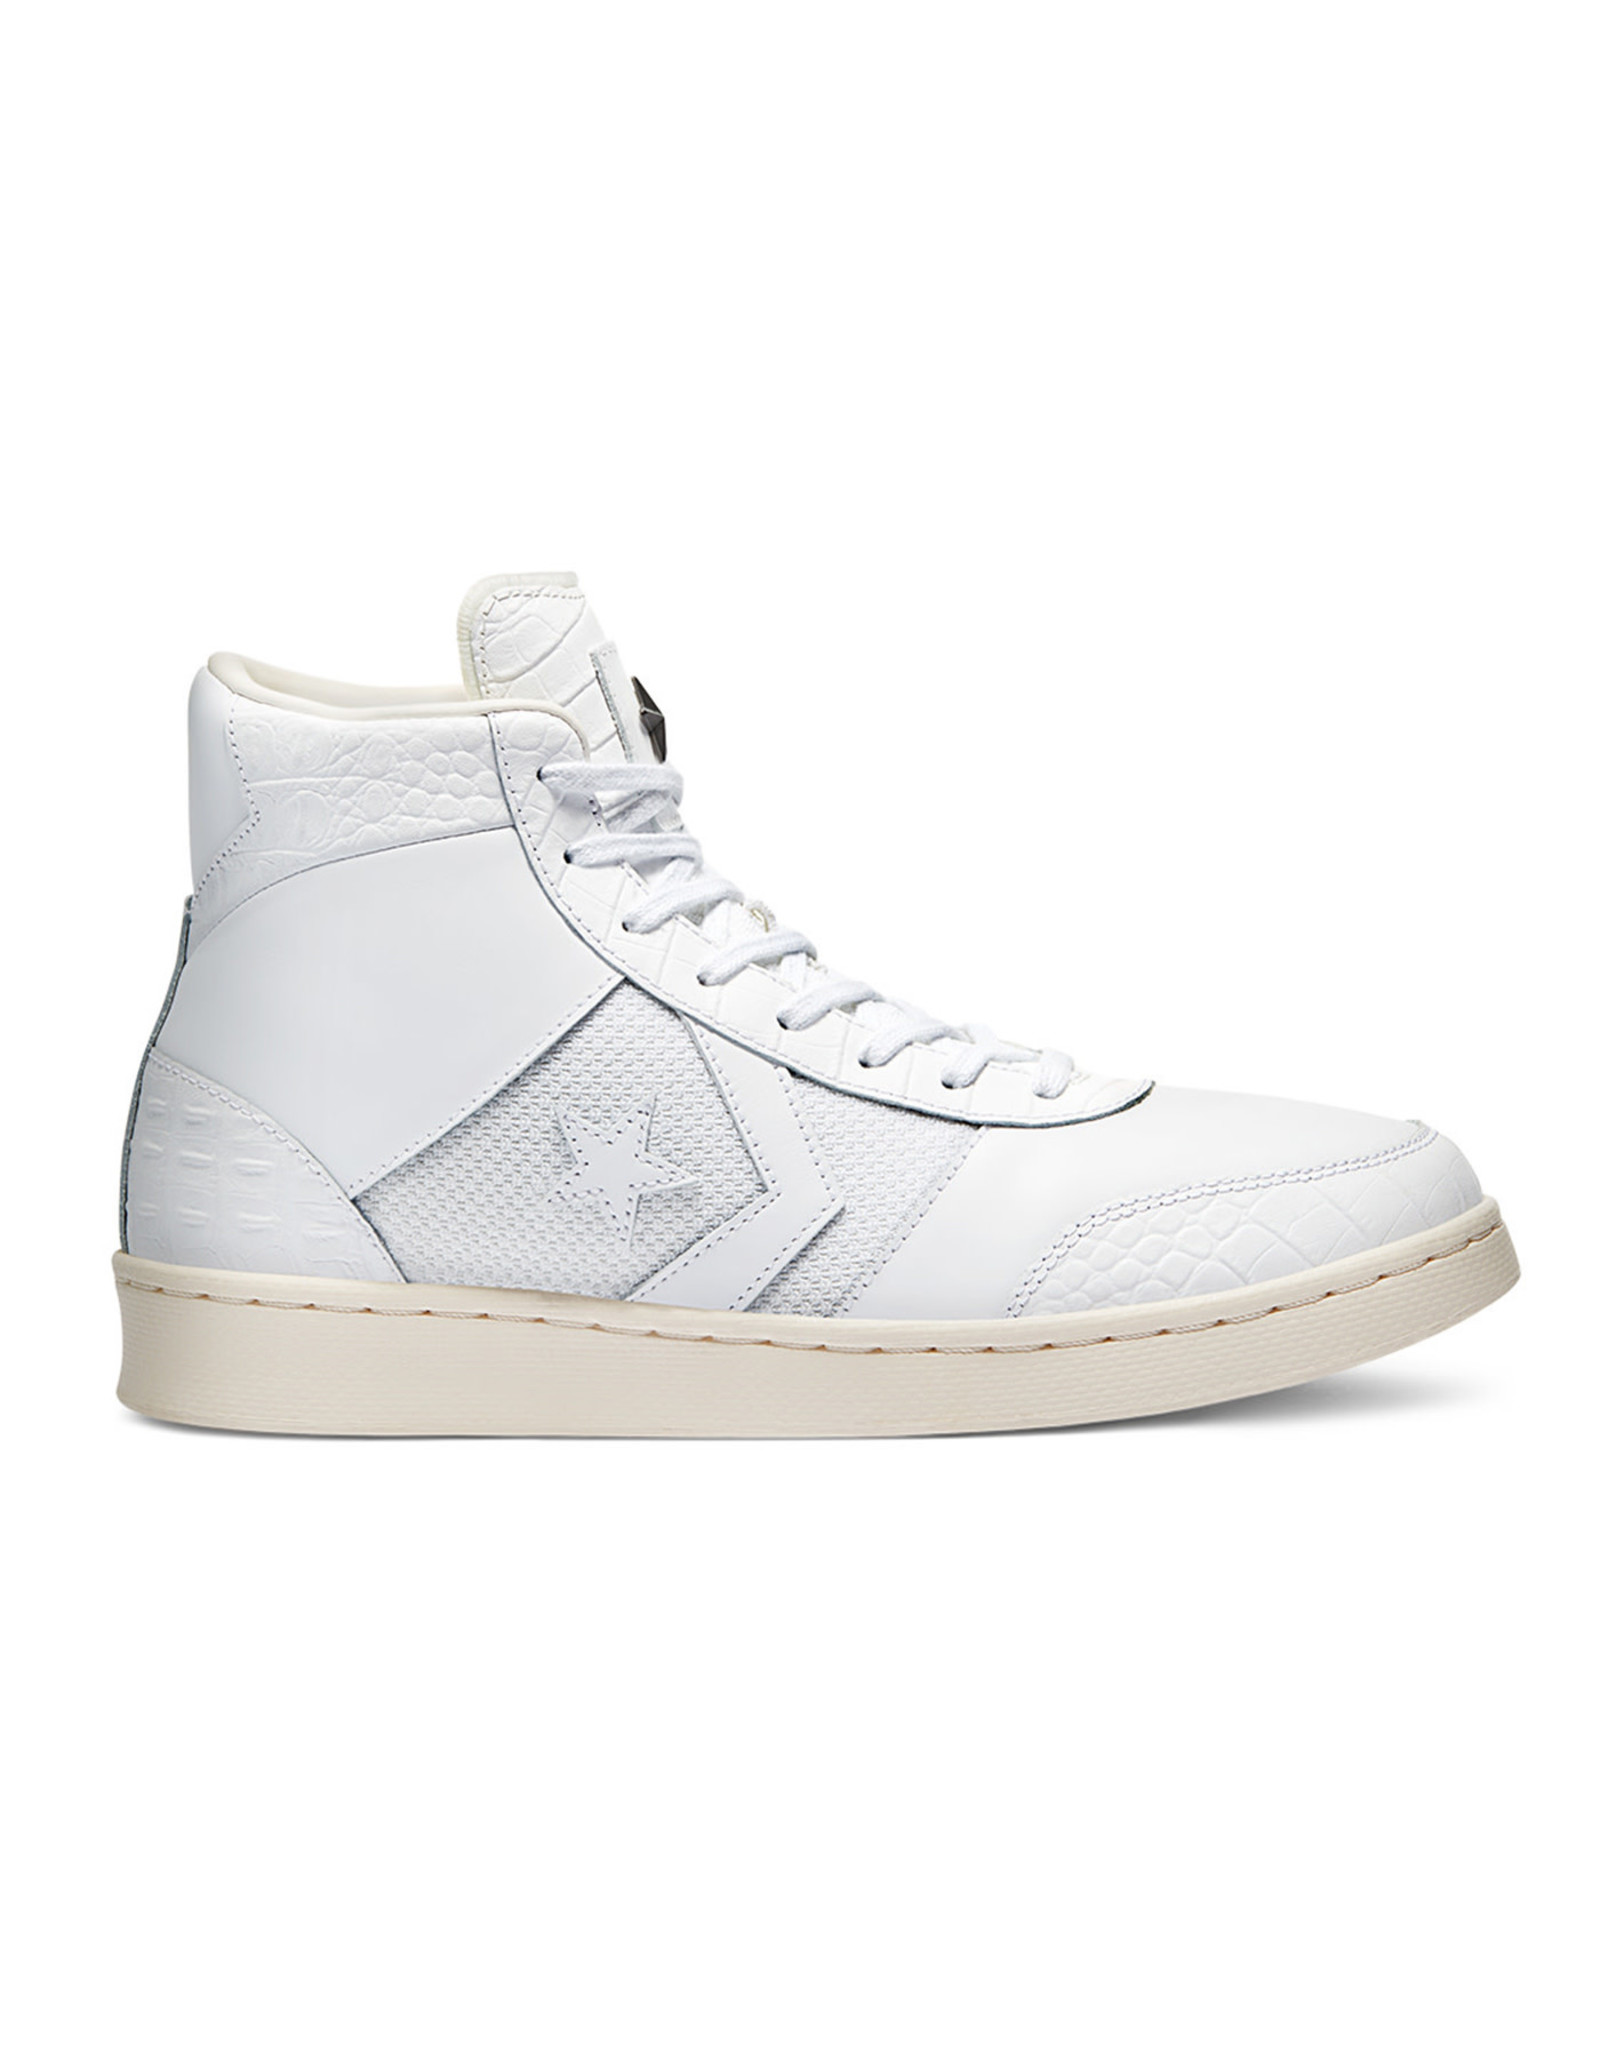 CONVERSE PRO LEATHER SPORT HI WHITE/WHITE/EGRET C189SPO-170902C